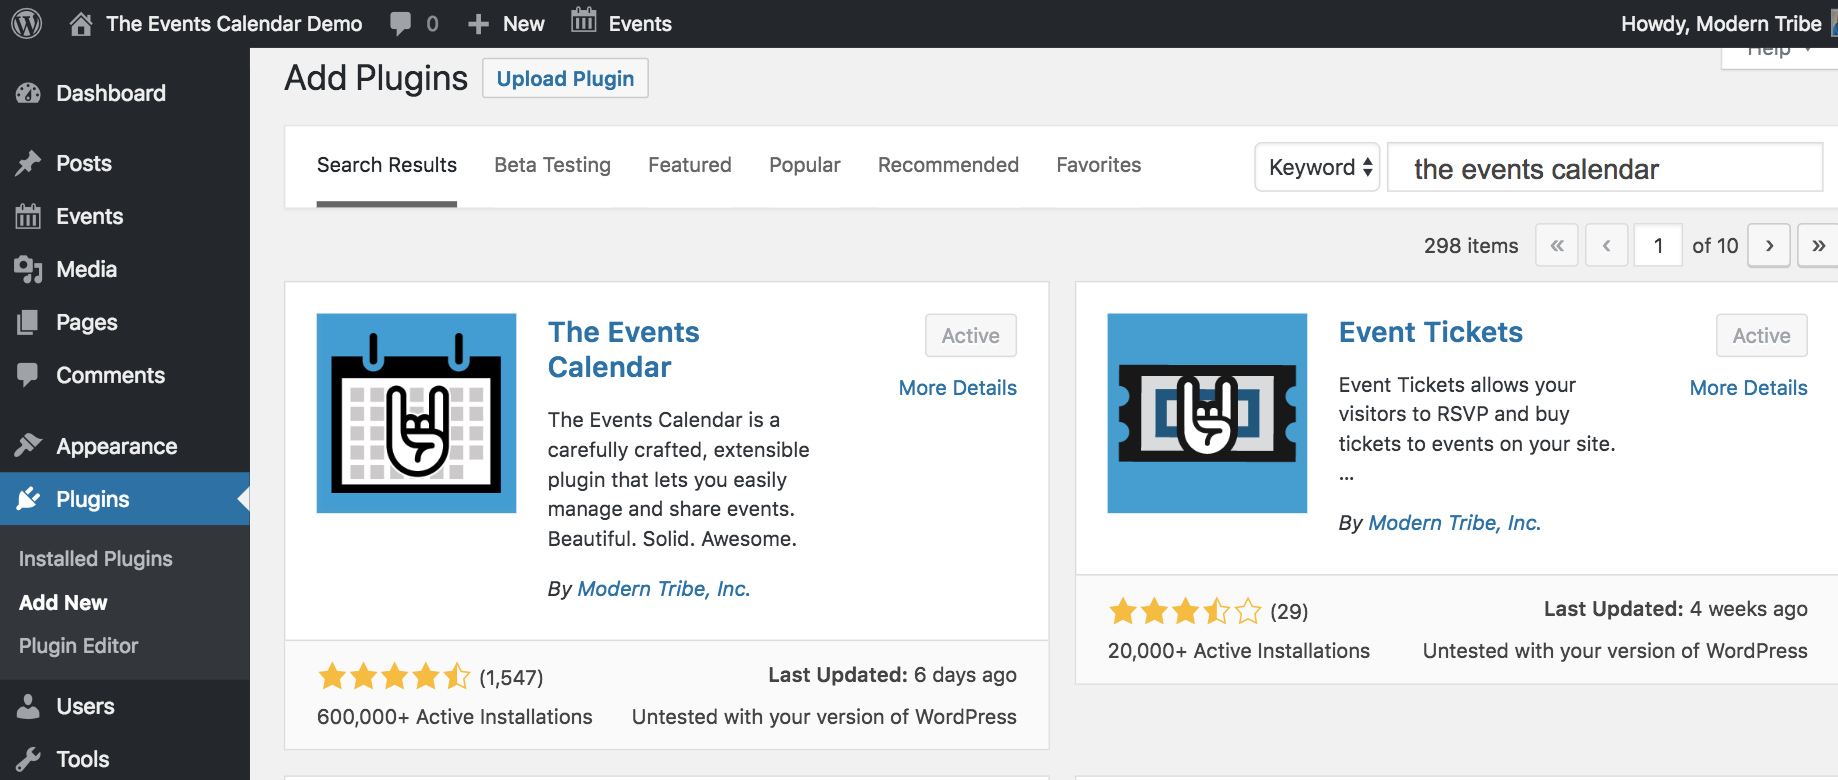 How to install The Events Calendar plugin: Go to Plugins > Add New and browse for The Events Calendar or Upload Plugin to upload Events Calendar Pro